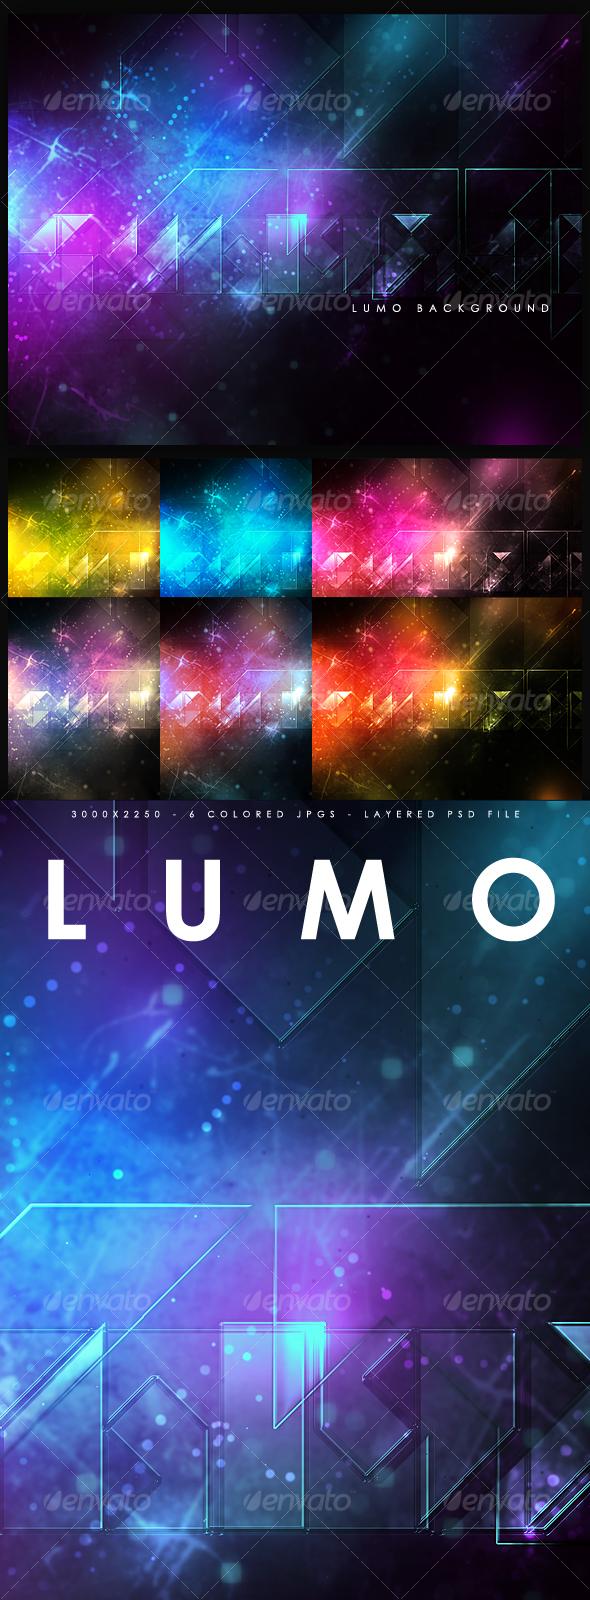 Lumo Background - Tech / Futuristic Backgrounds